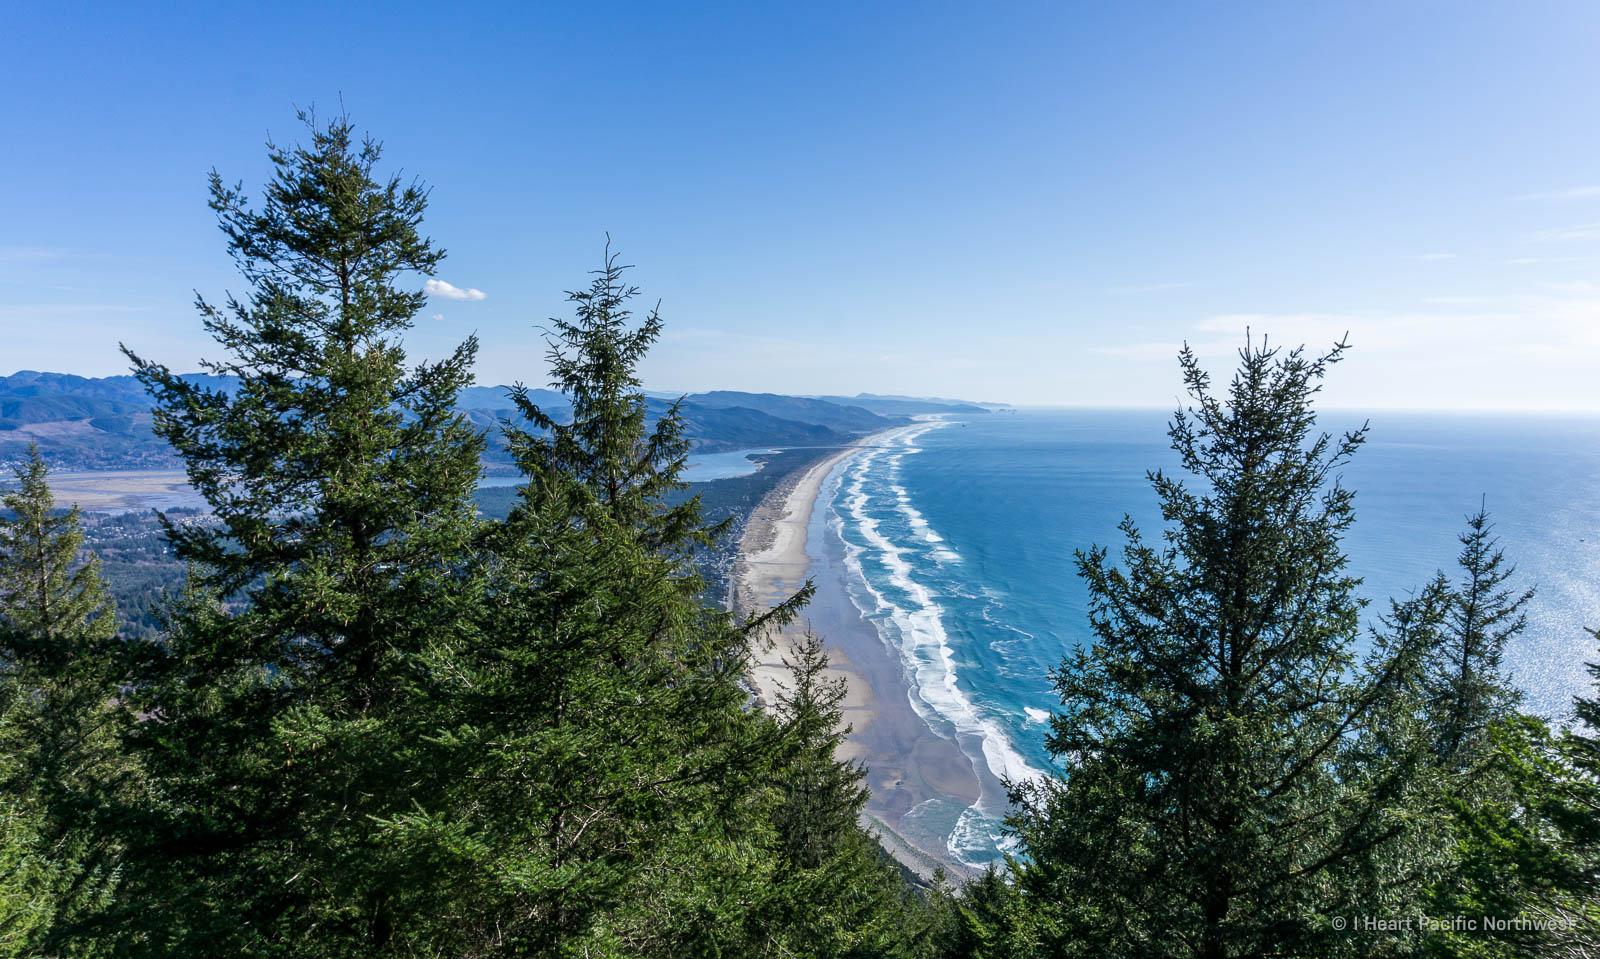 Neahkahnie Mountain hike